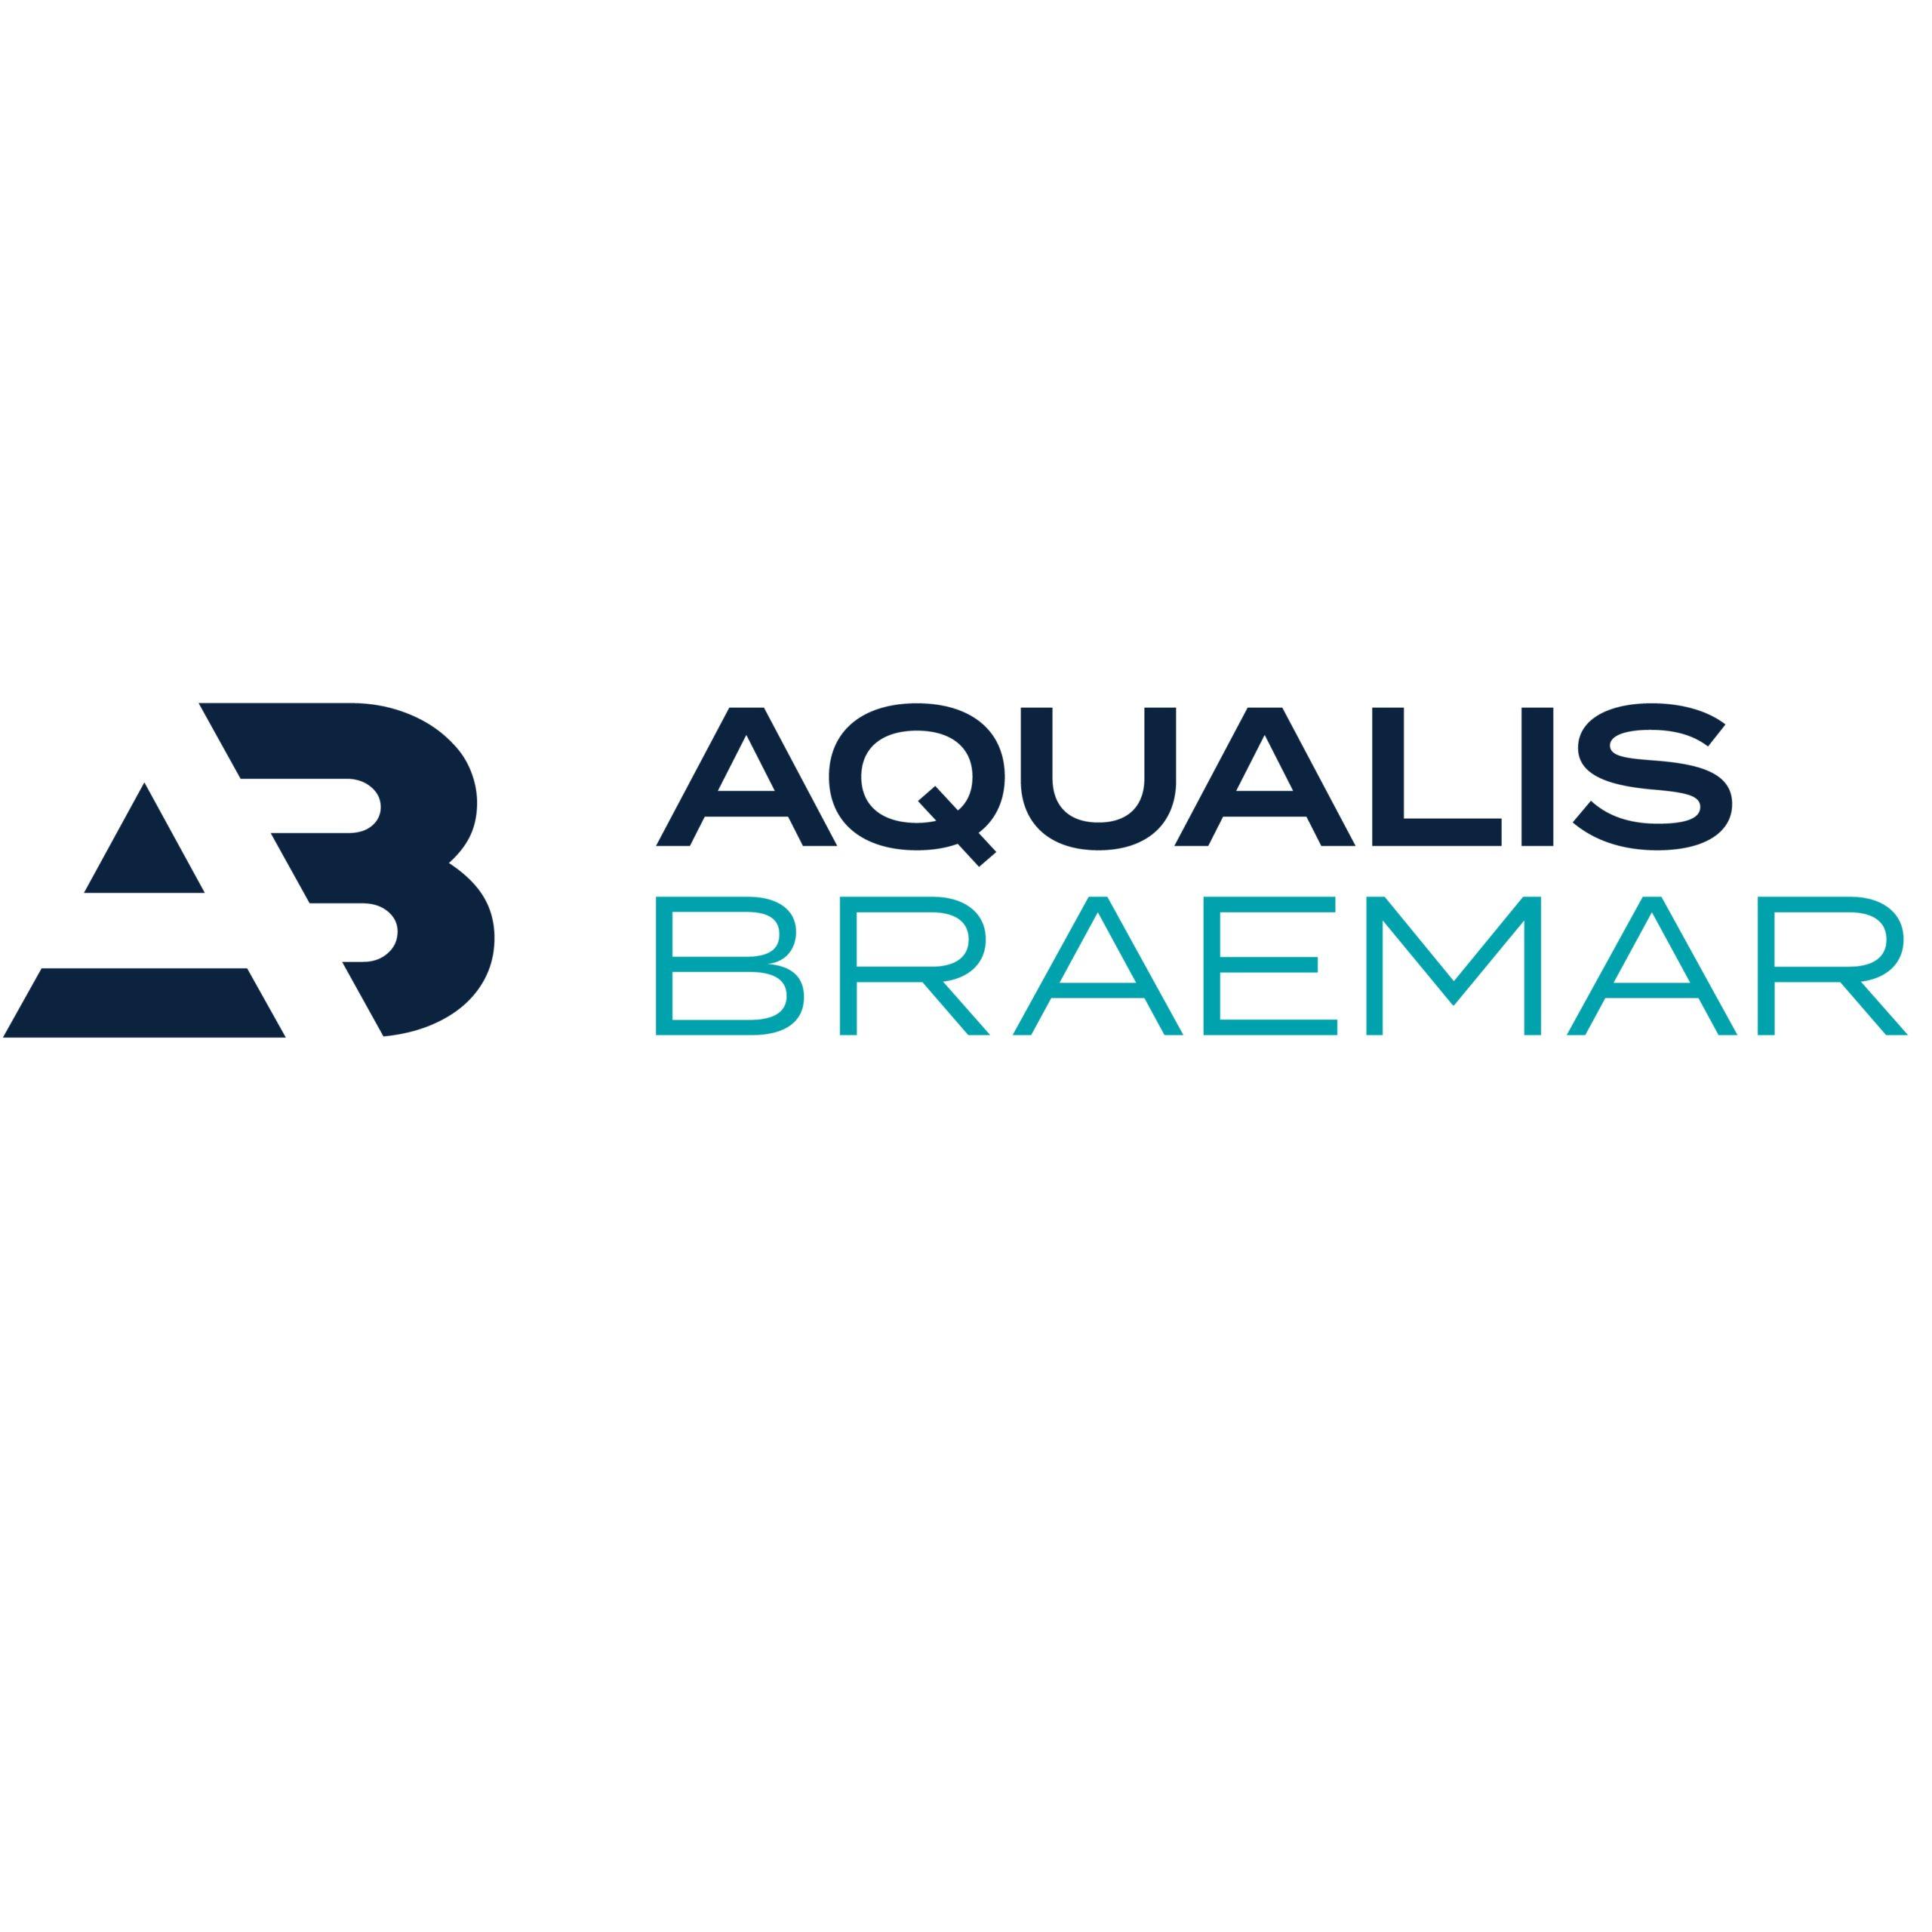 AqualisBraemar